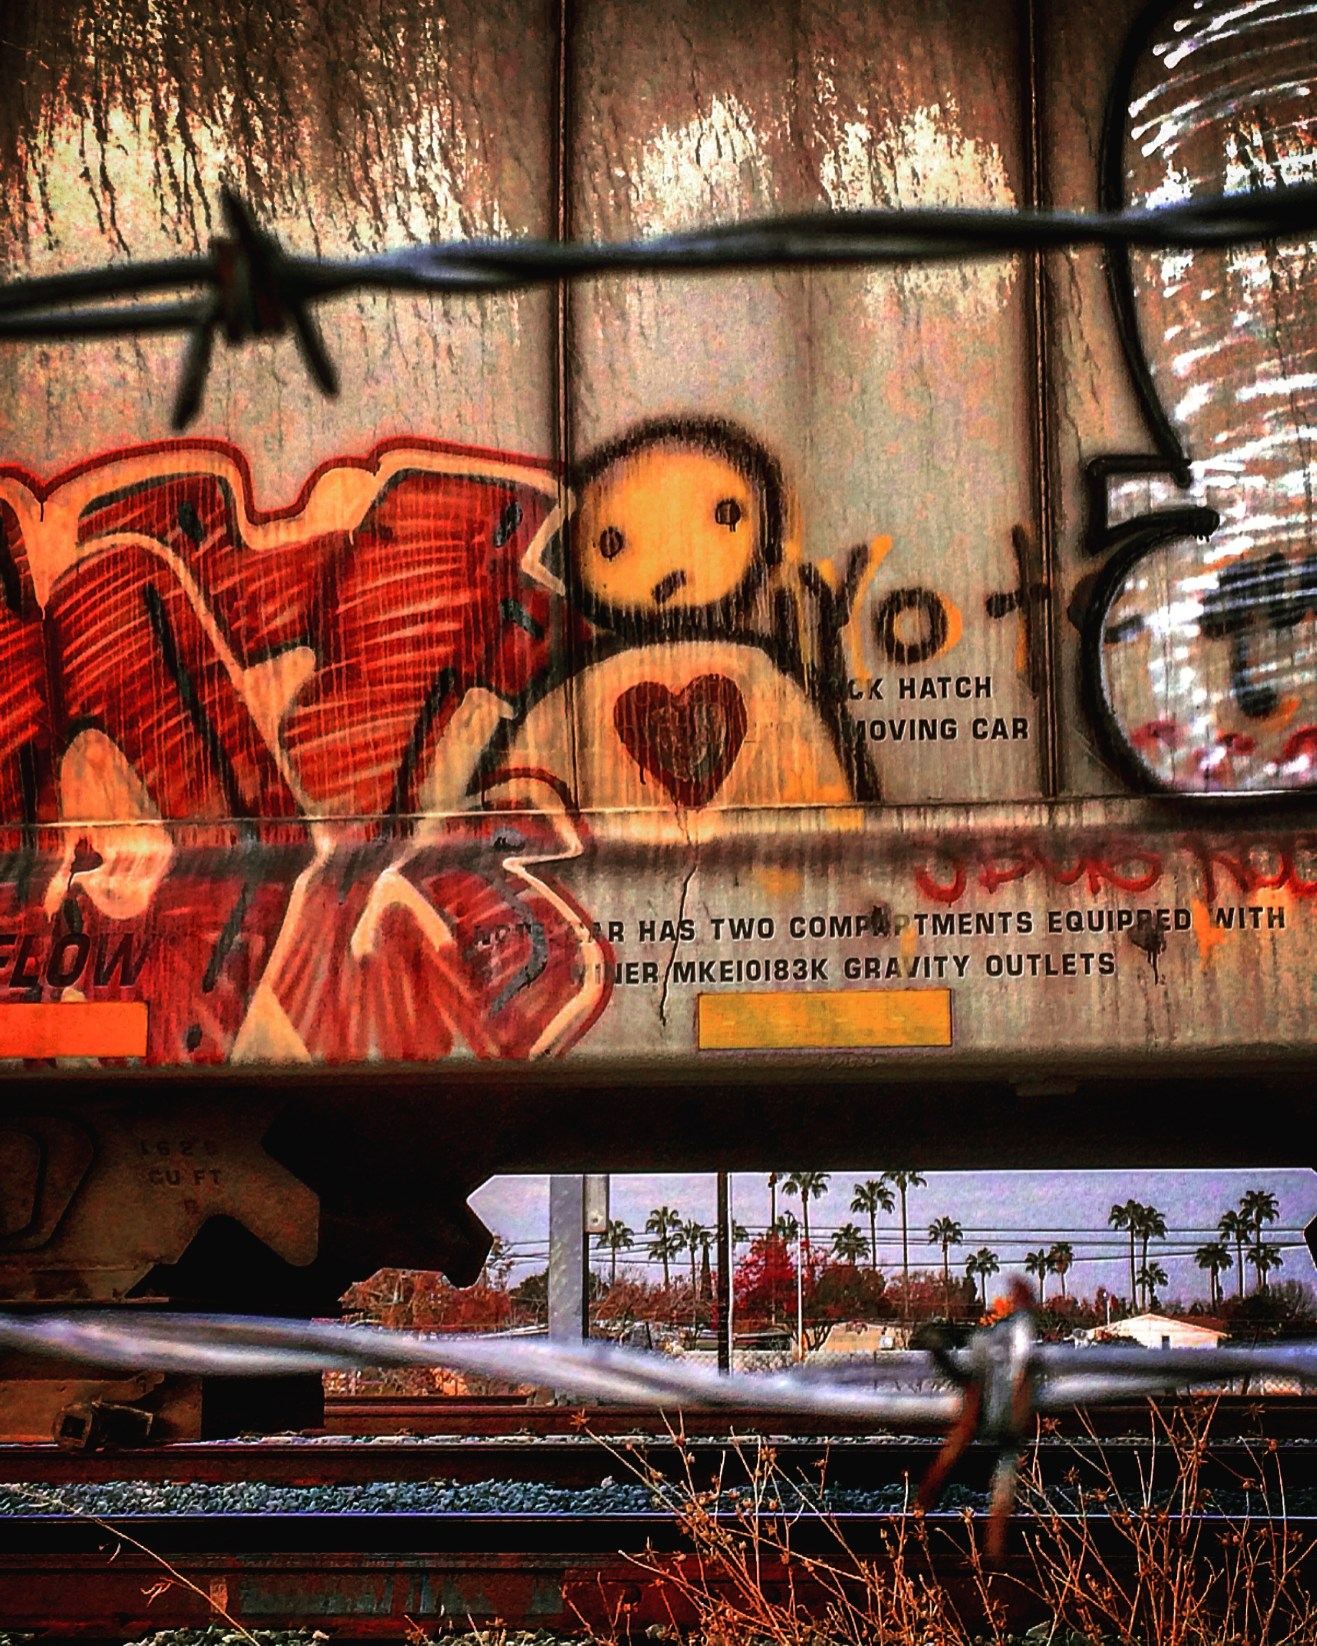 Box Car, Unknown artist, Granite Regional Park, Sacramento, CA